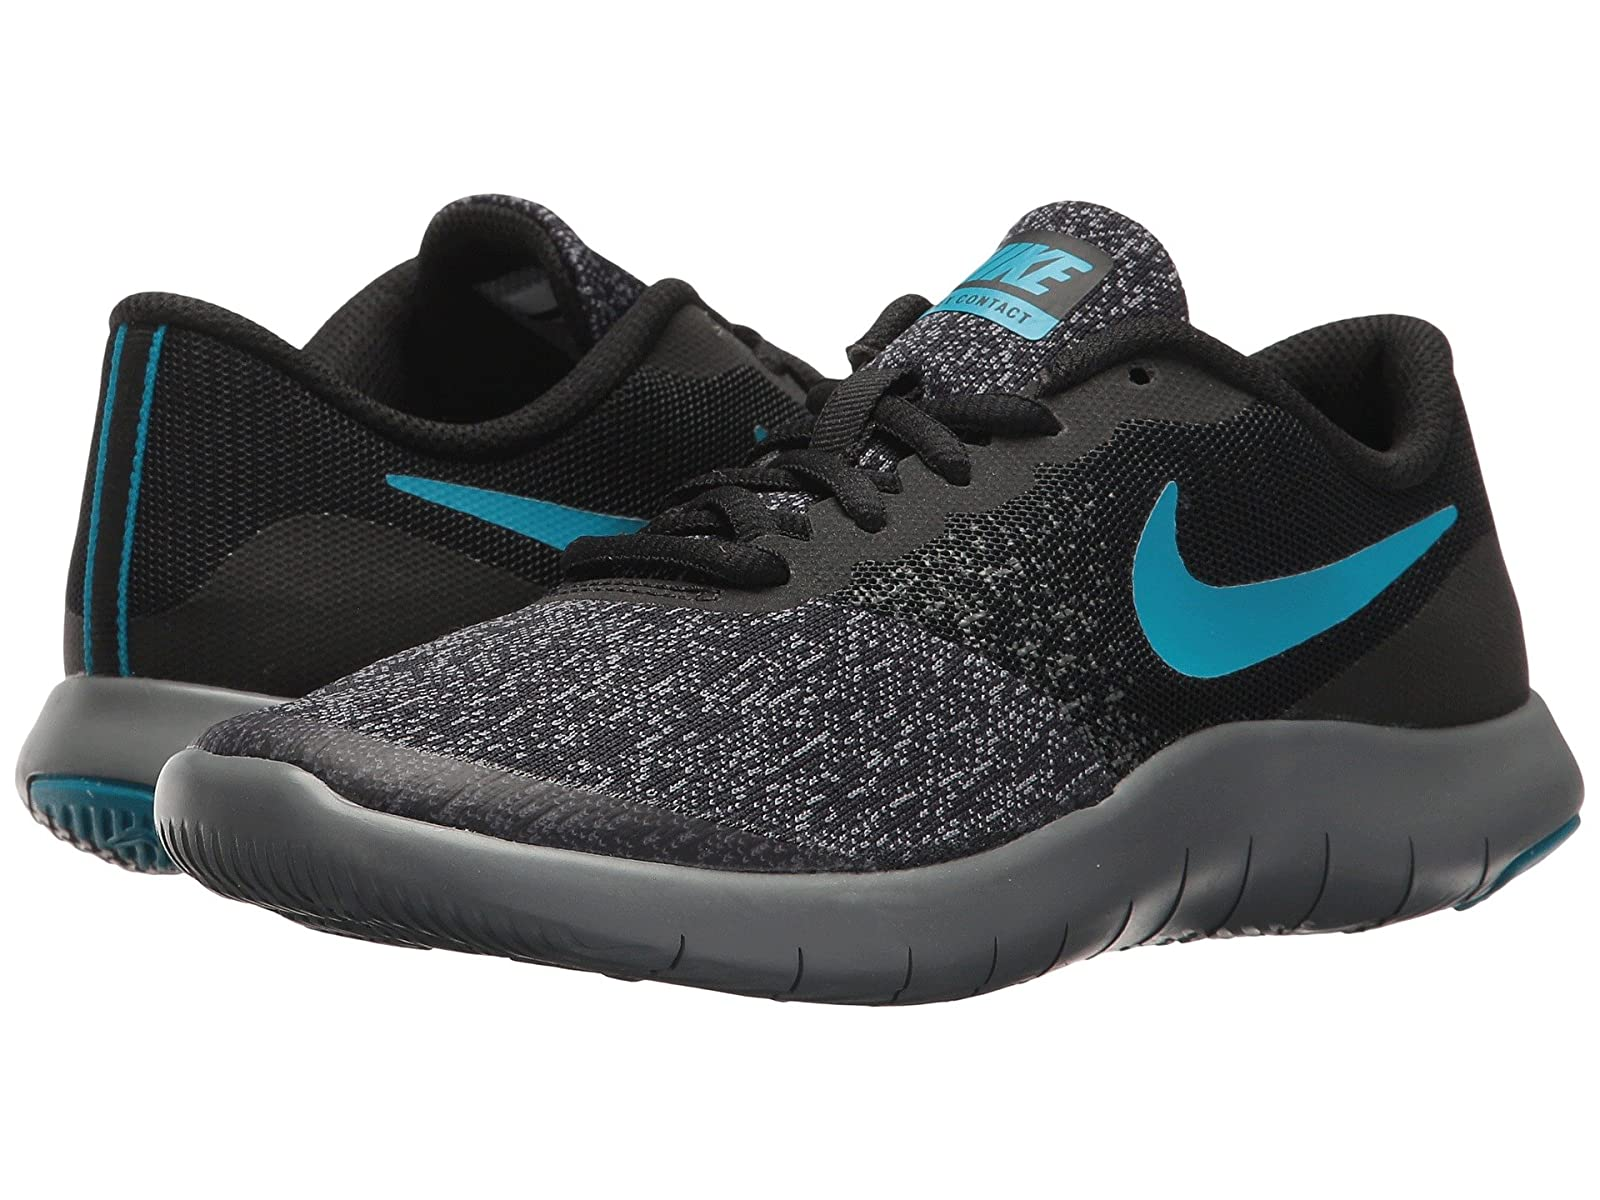 Nike Kids Flex Contact (Big Kid)Atmospheric grades have affordable shoes